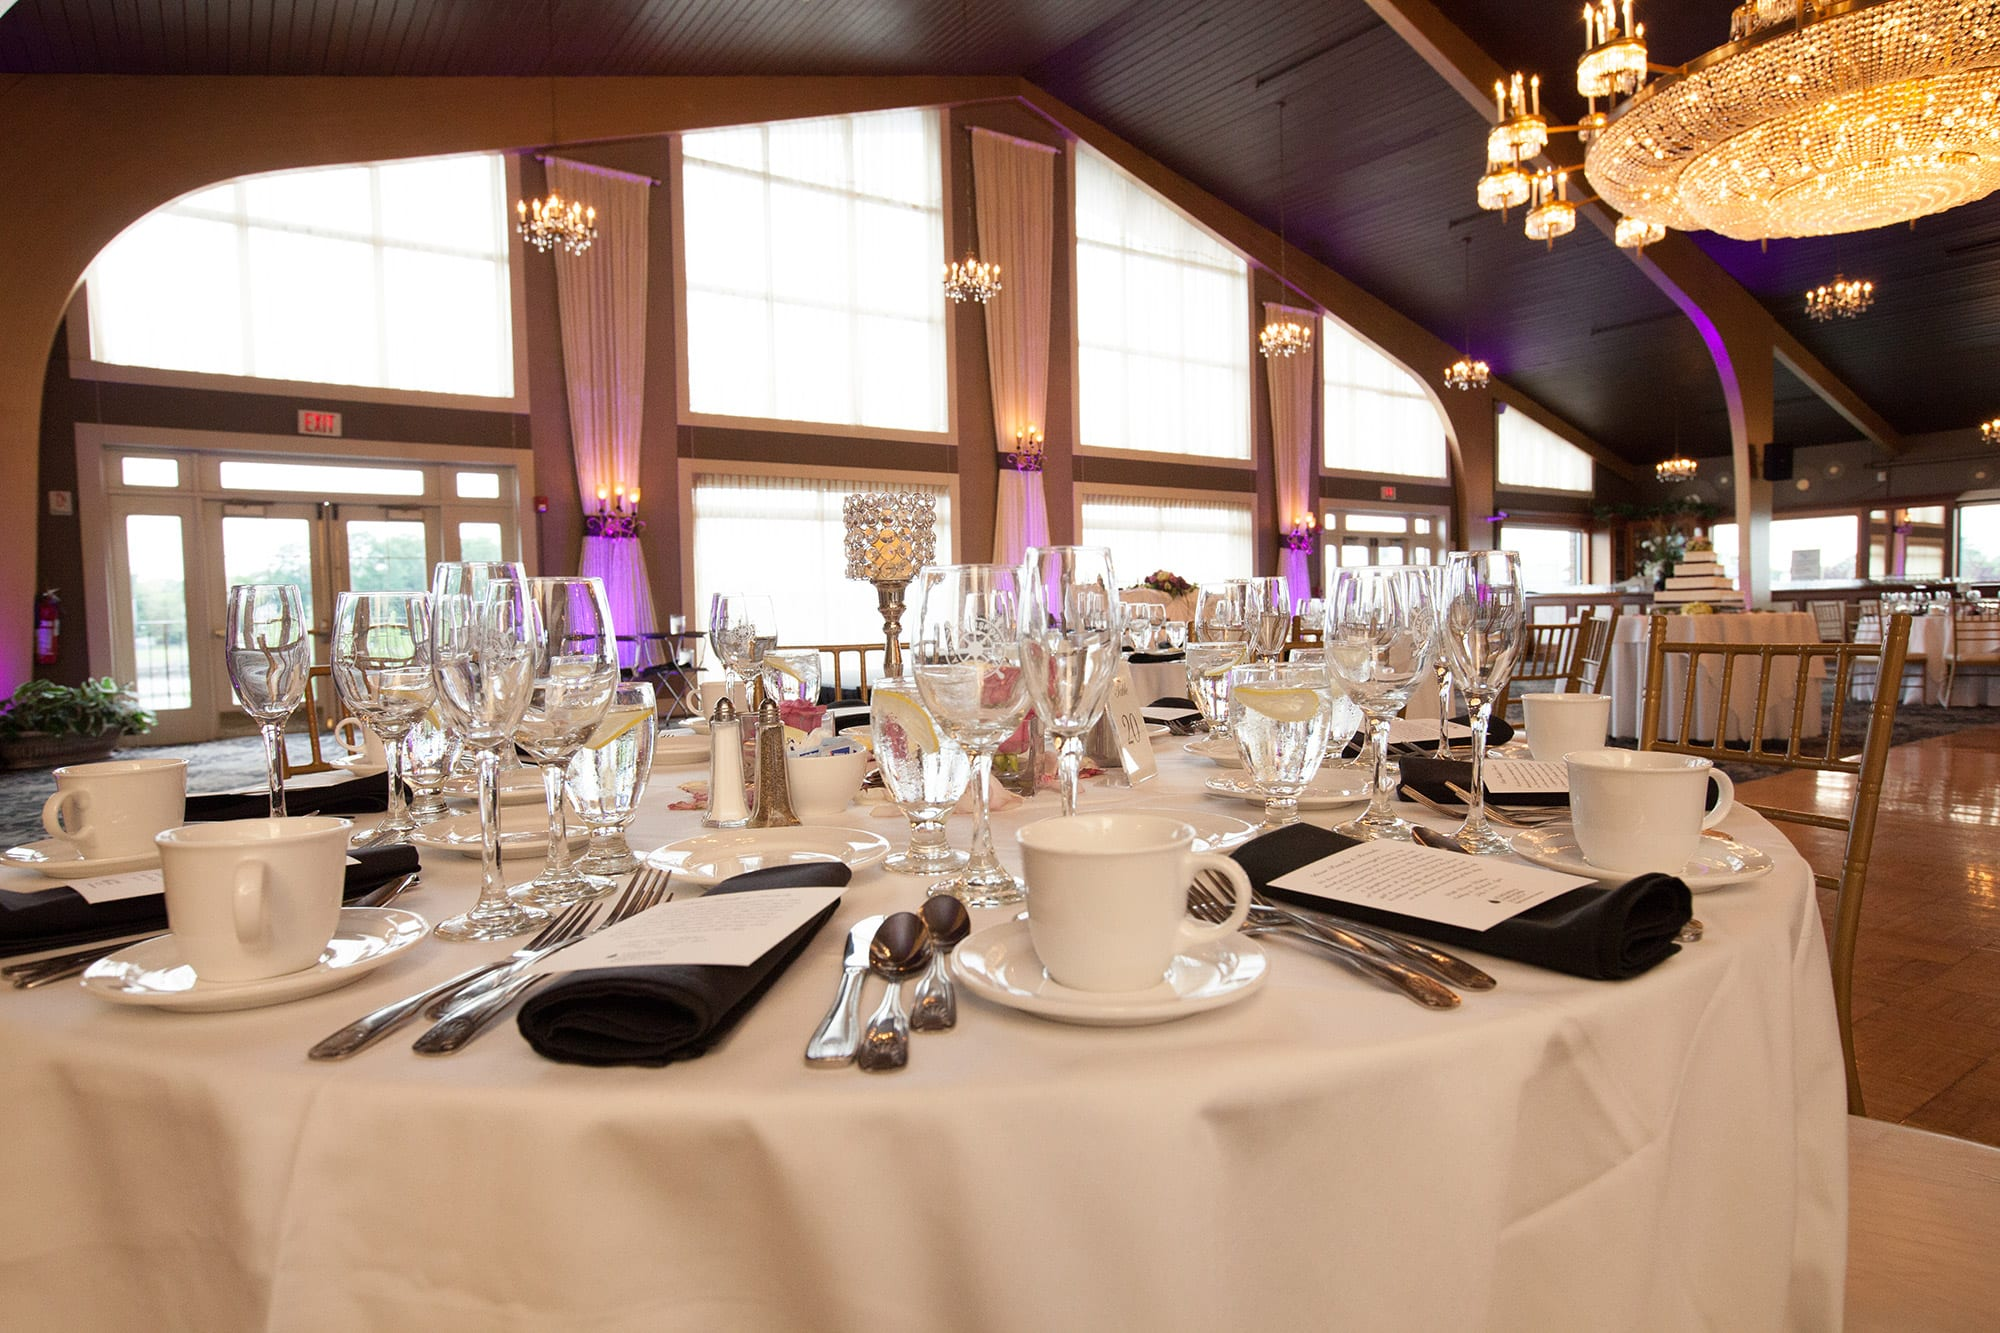 An intricate tablesetting in the Danversport Harborview Ballroom